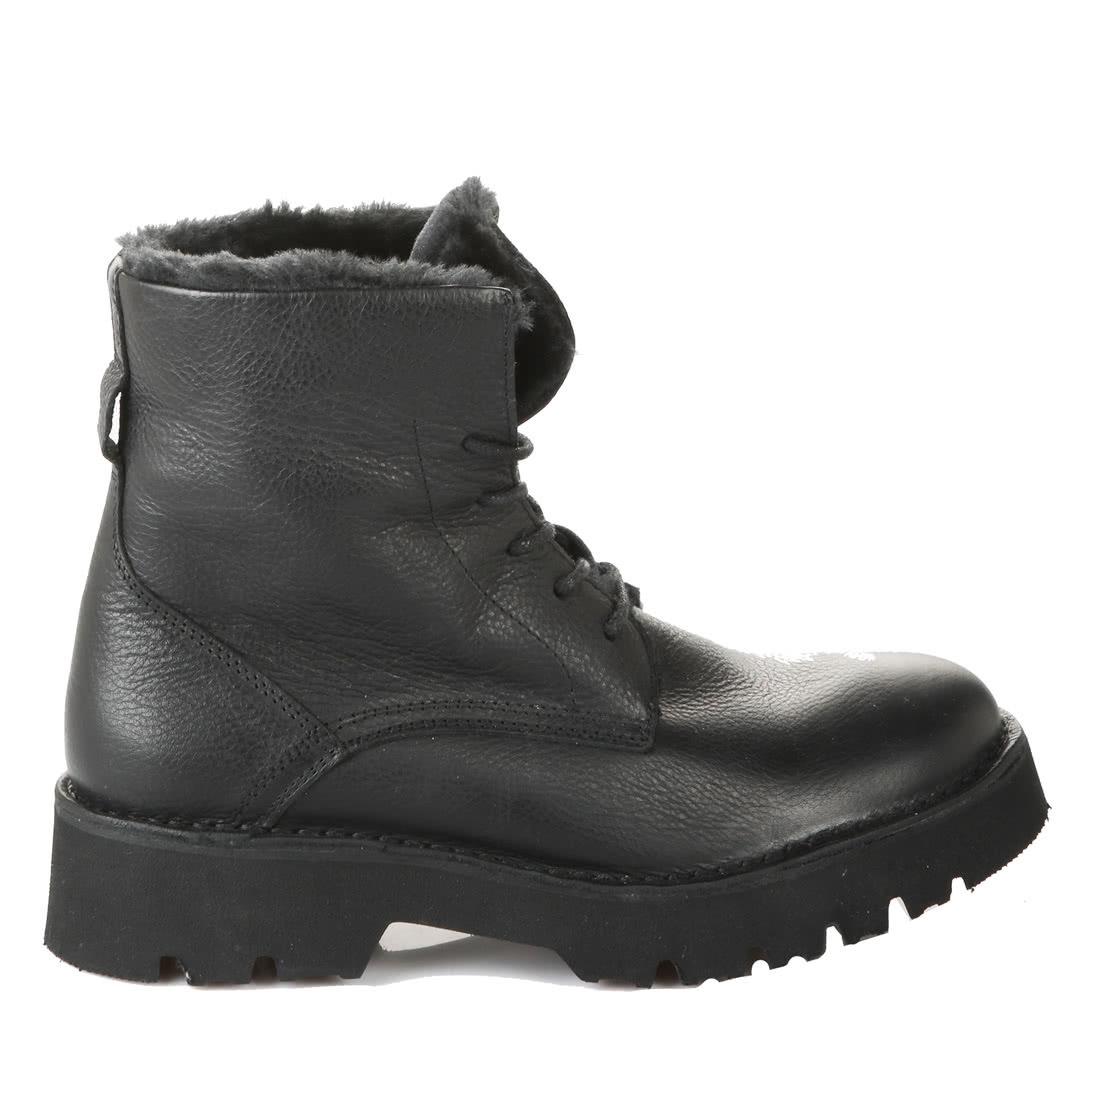 lowest price 20bde ebc03 Stucco Boot aus Leder mit Fell schwarz online kaufen | BUFFALO®